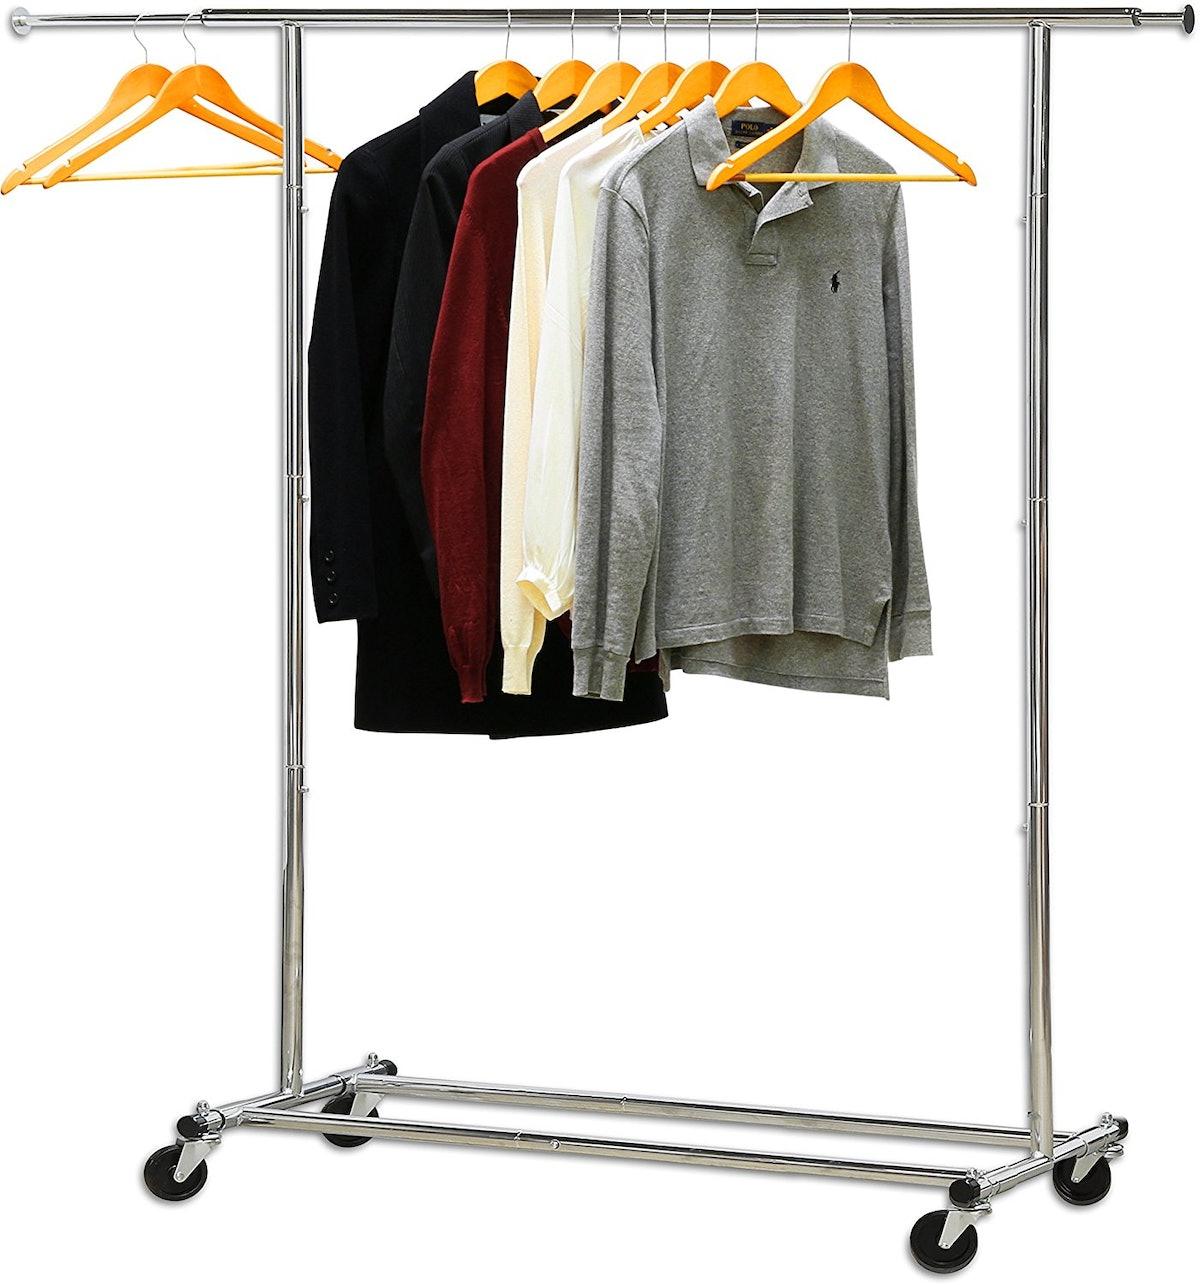 Simple Houseware Clothing Garment Rack